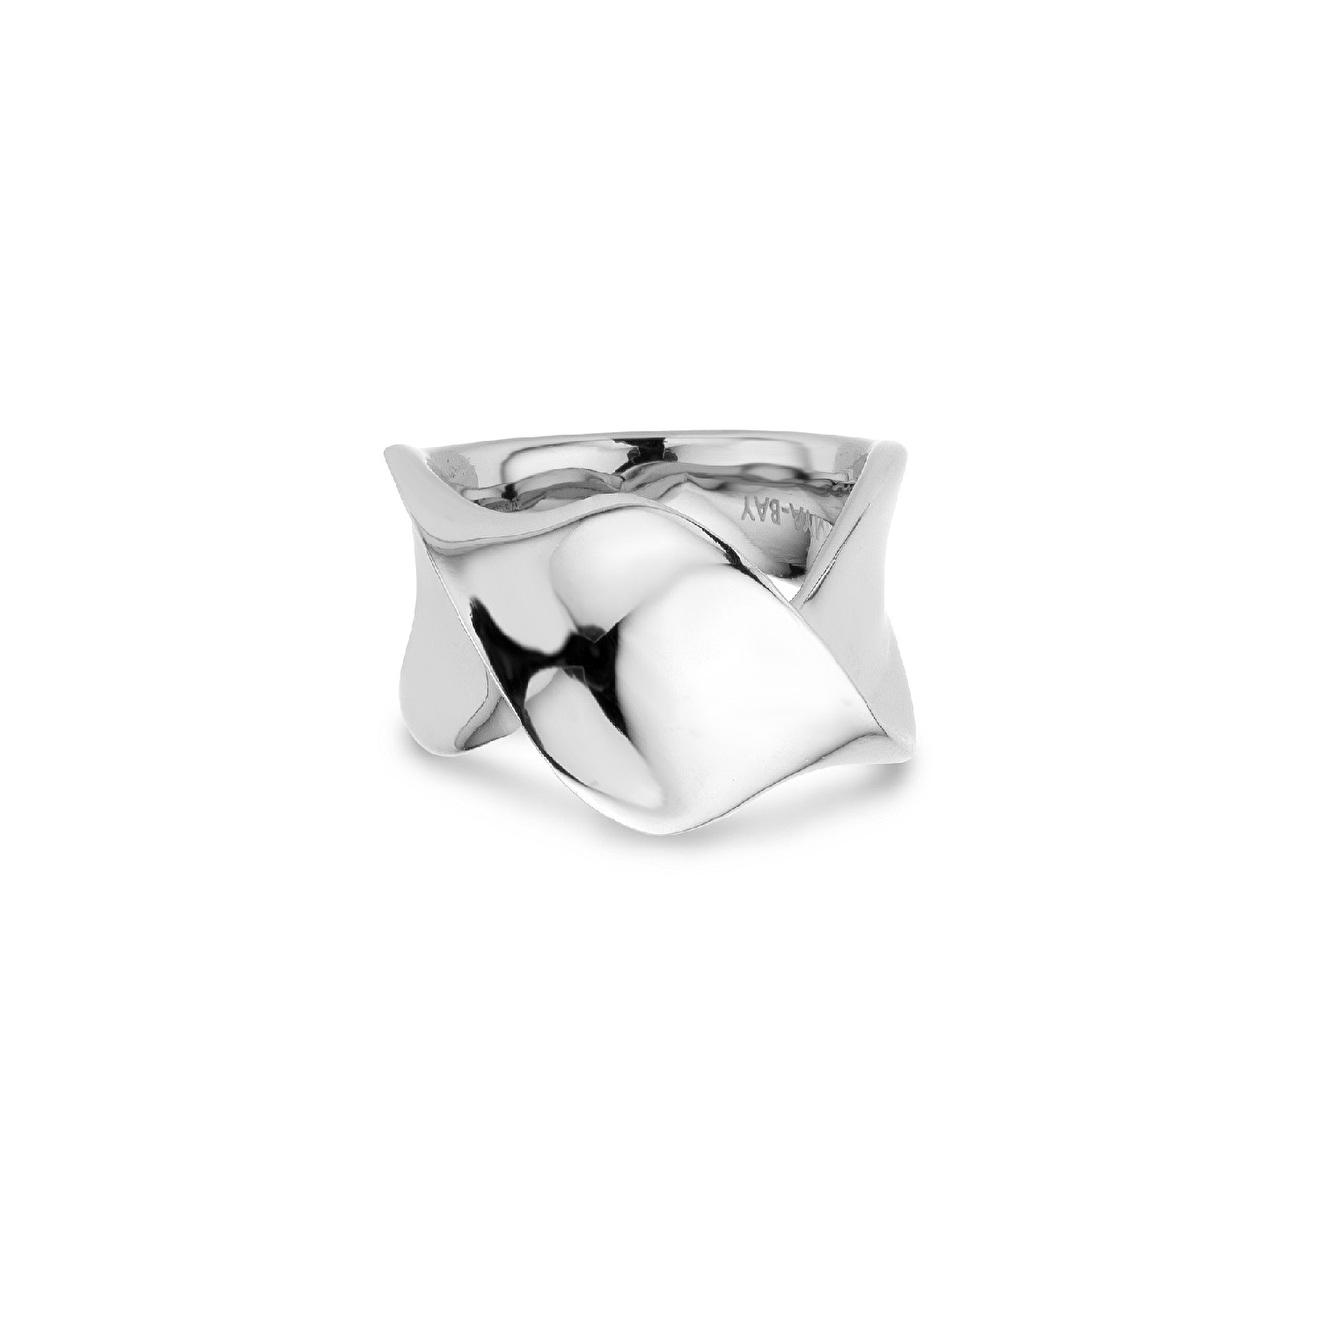 Mya Bay Покрытое серебром кольцо Amy